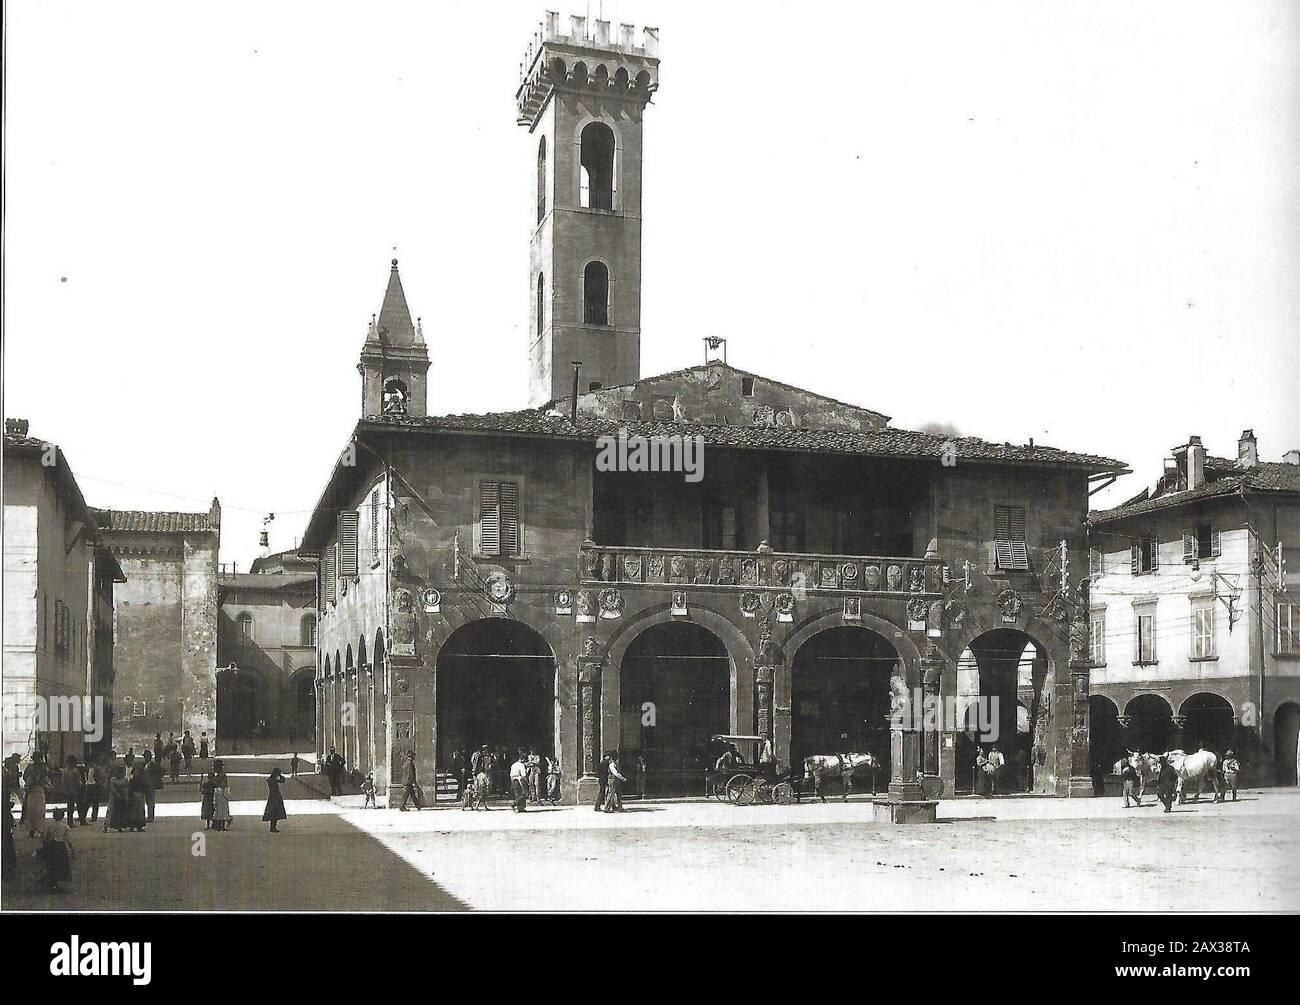 Italiano: San Giovanni Valdarno - Foto d'epoca; 1 janvier 1930; Foto d'epoca; inconnu; Banque D'Images